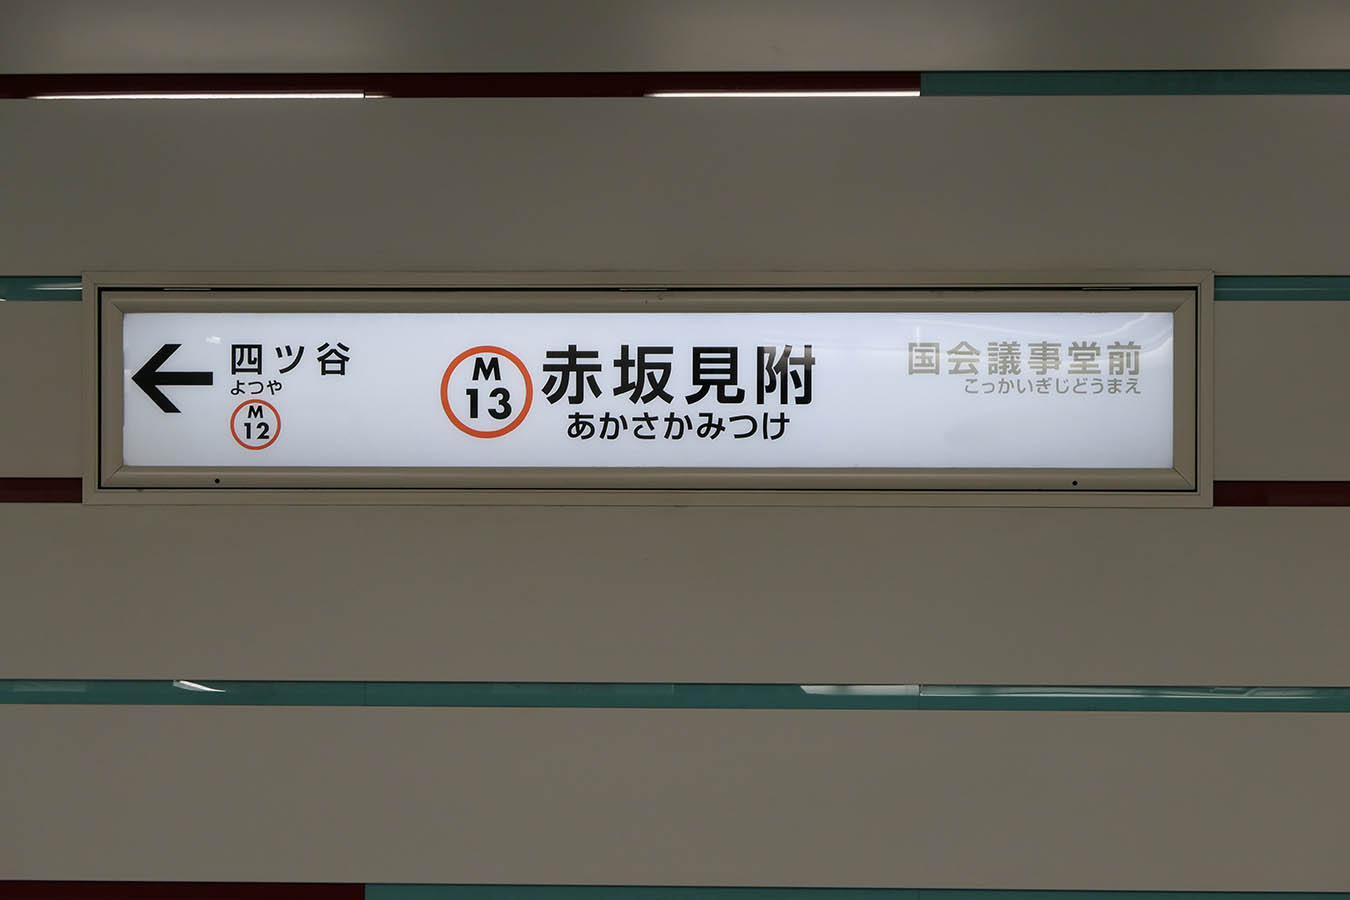 M13_photo04.jpg